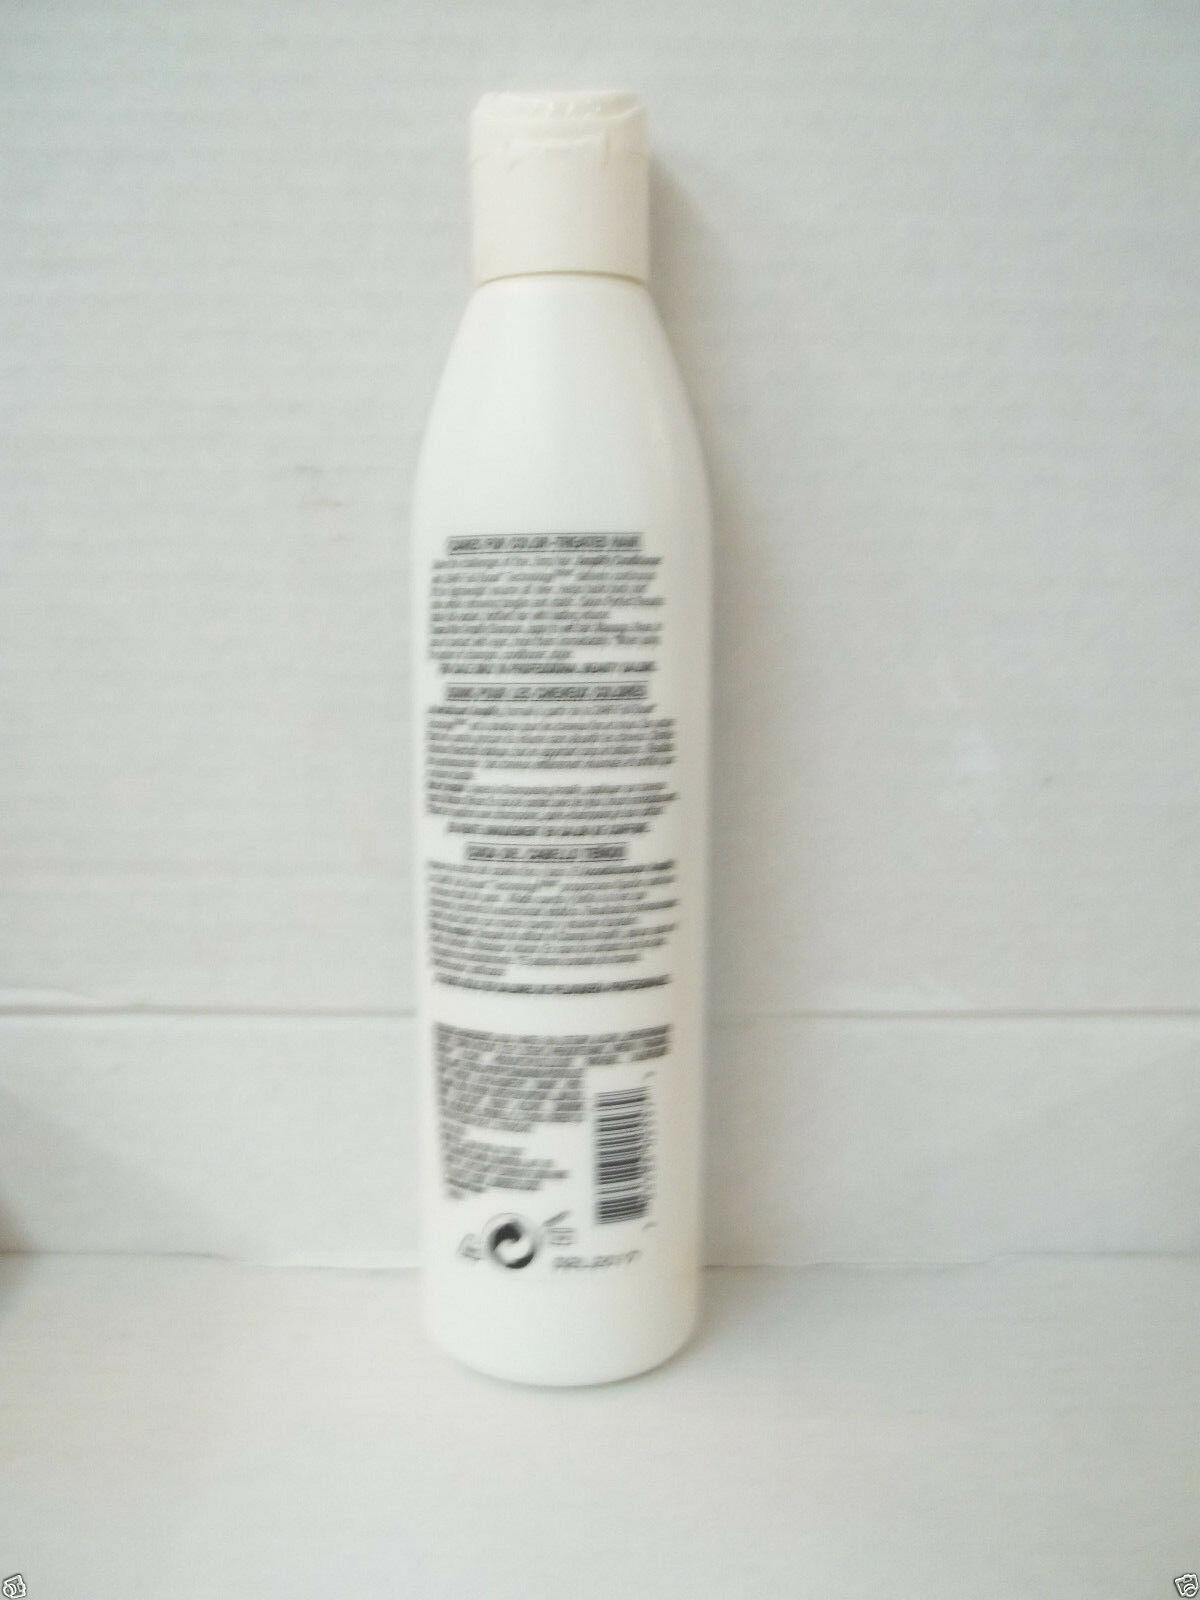 Matrix Total Results HELLO BLONDIE SHAMPOO for Brilliance ~ 10.1 fl oz / 300 ml